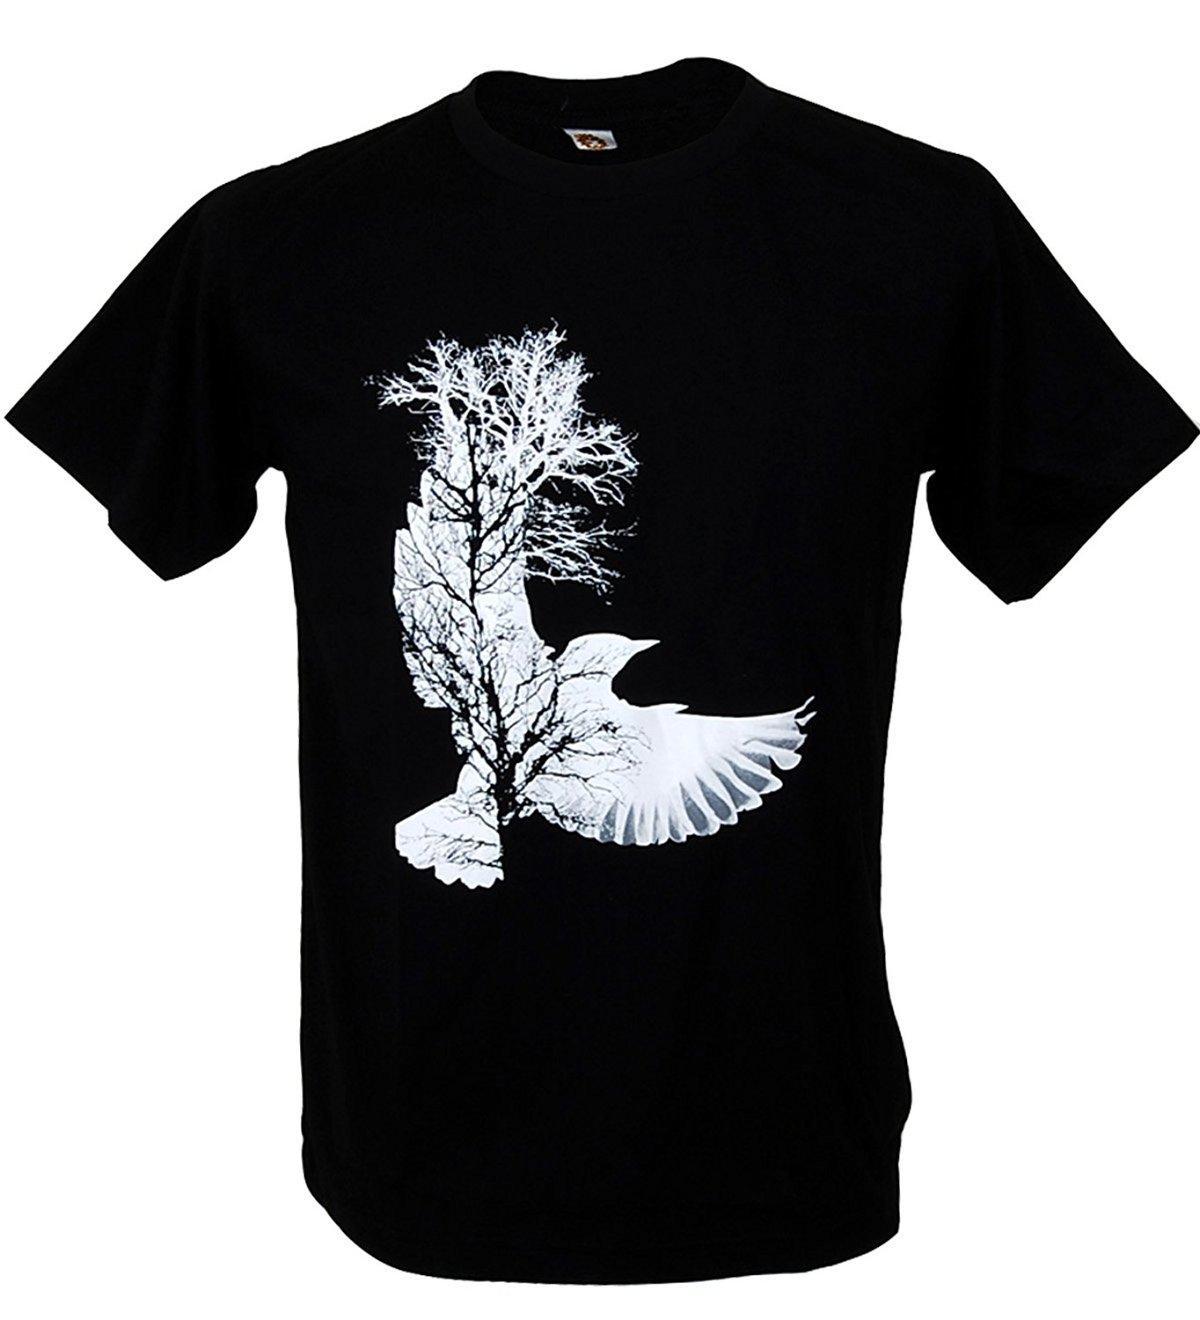 Bird tree design graffiti art graphic t shirt design t shirt mens high quality t shirts 2017 brand clothes slim fit printing online shirts t shirt design